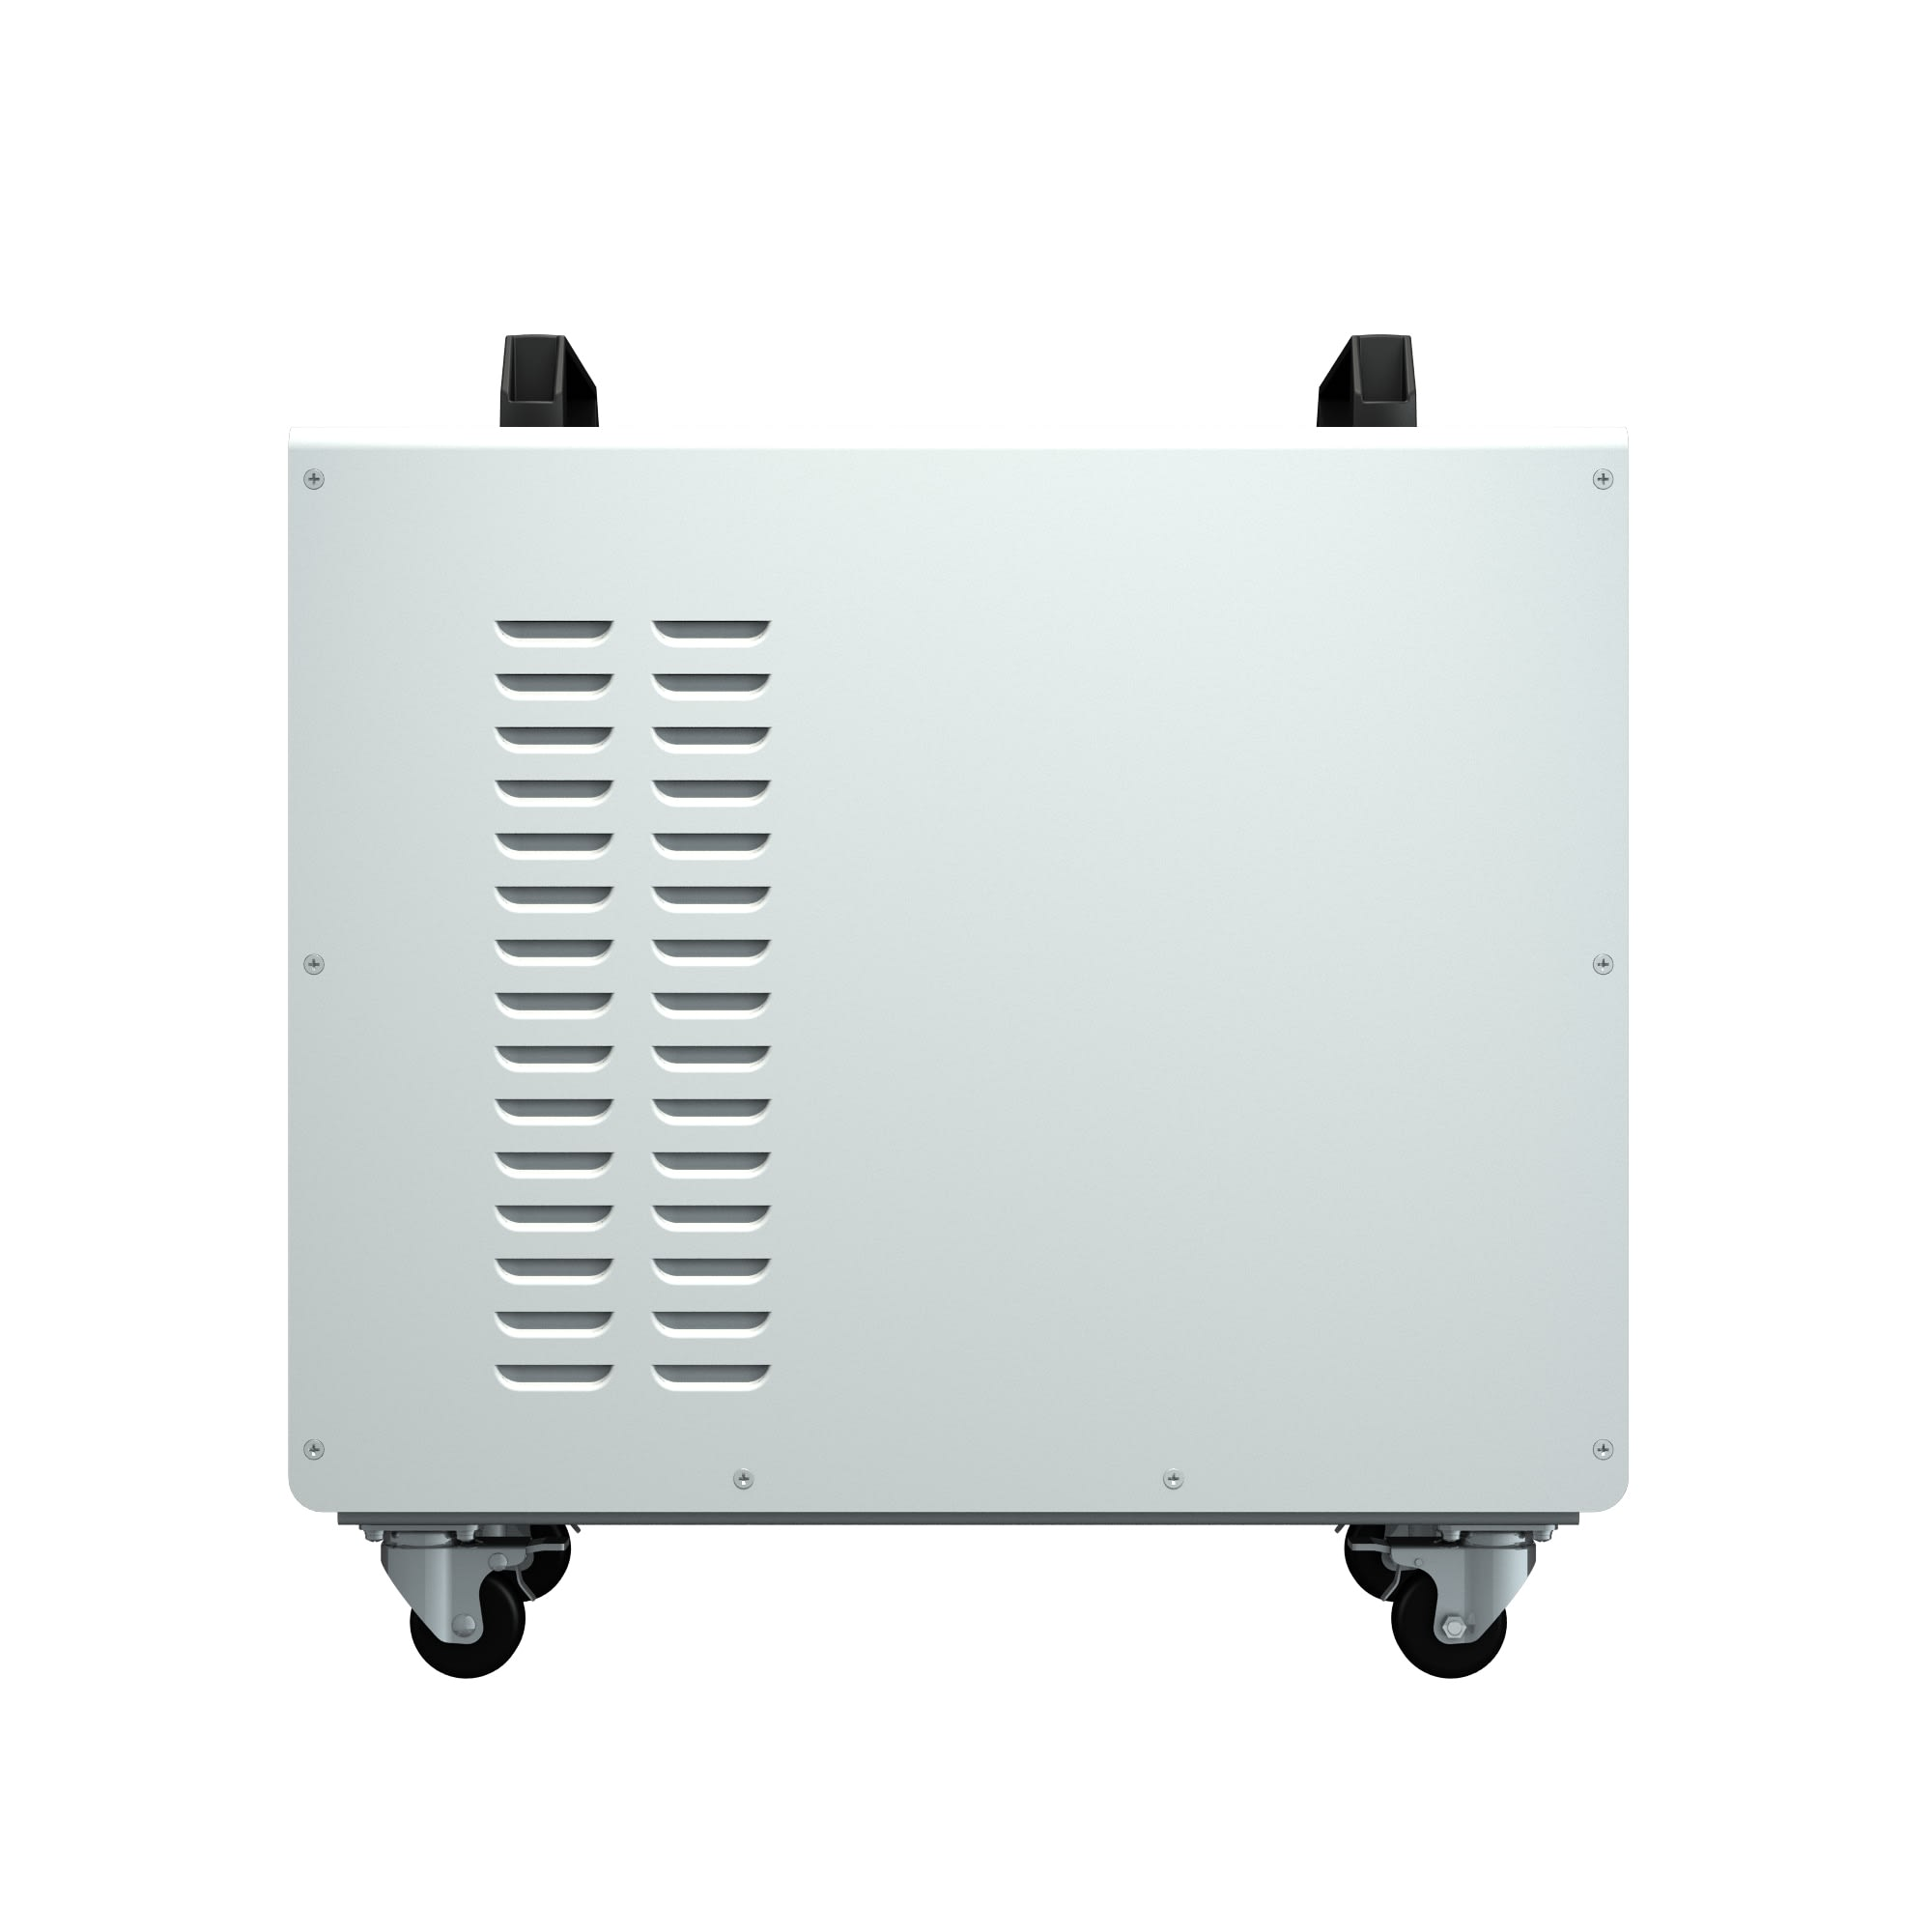 UpSolar Sistema Generador Solar Integrado para Hogares